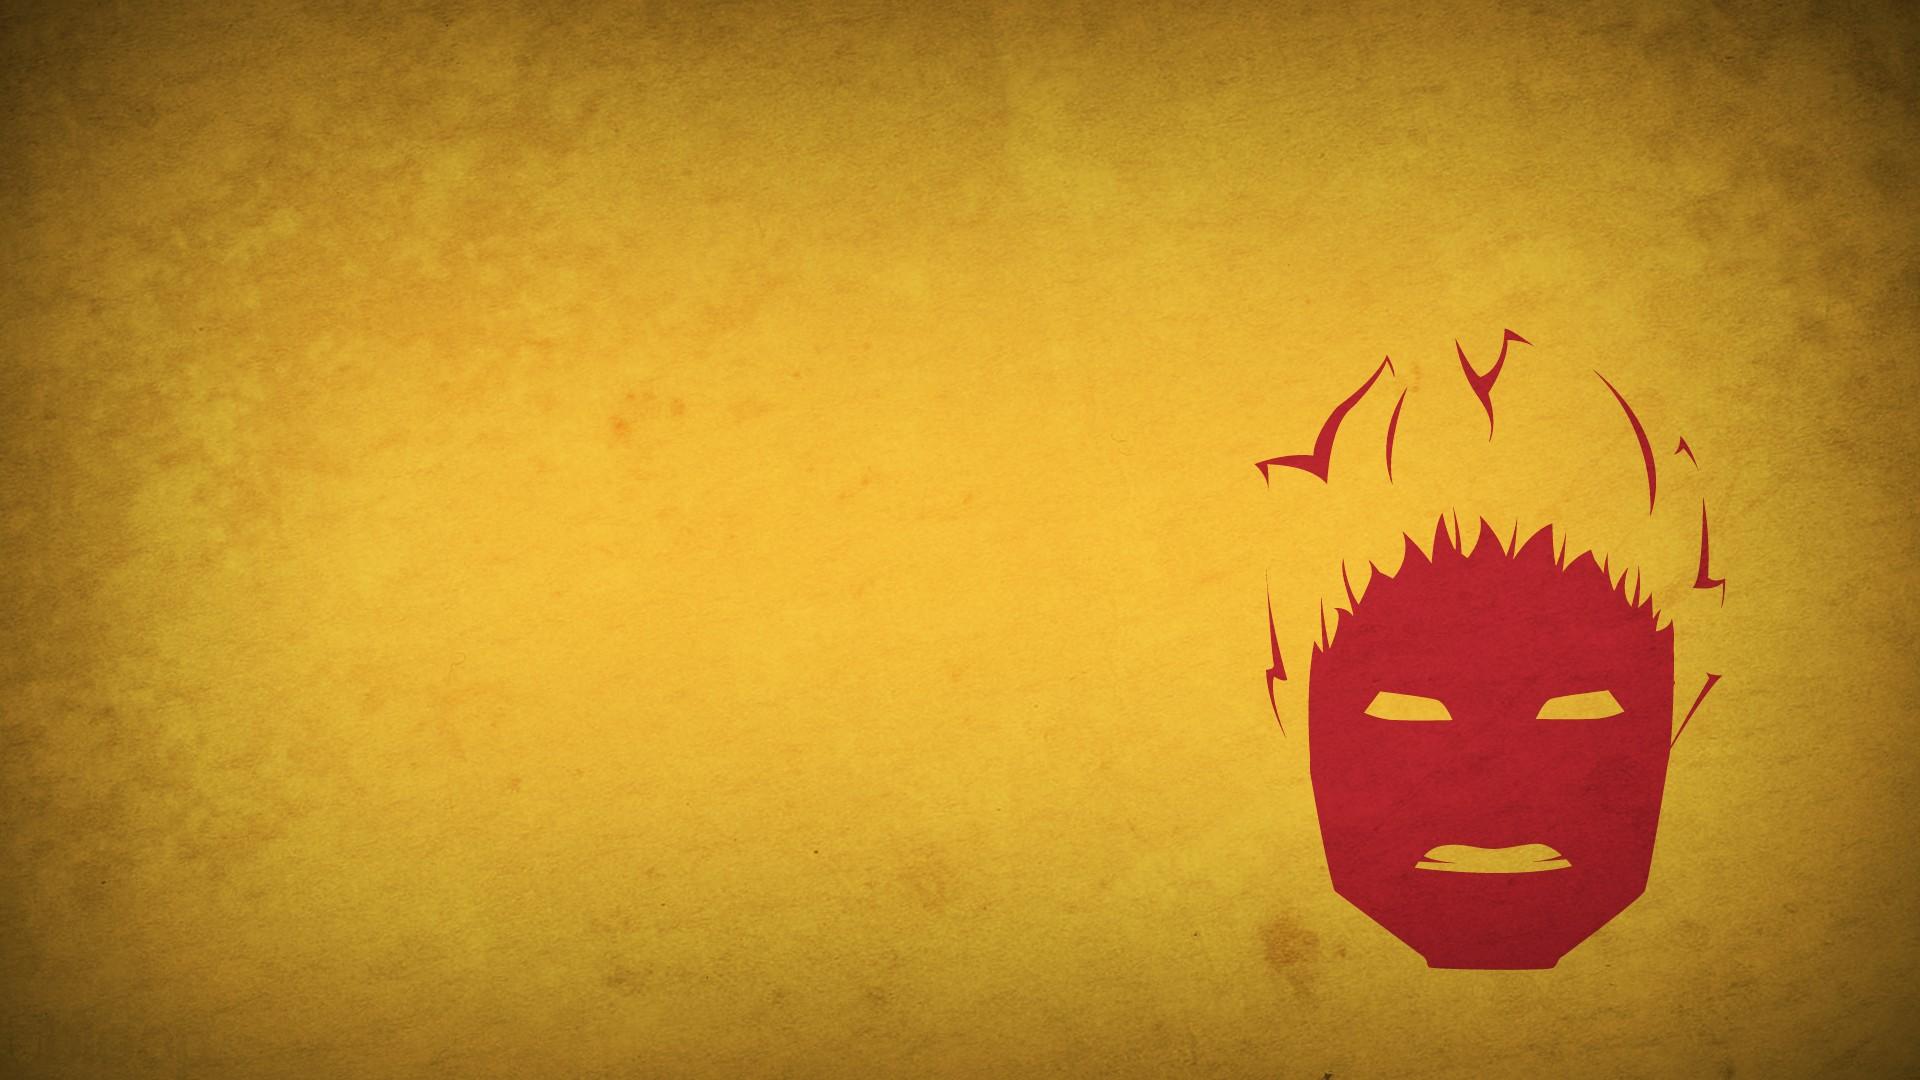 Good Wallpaper Marvel Face - illustration-red-yellow-superhero-Sun-Marvel-Comics-circle-emotion-Marvel-Heroes-Human-Torch-Fantastic-Four-Blo0p-color-shape-darkness-computer-wallpaper-organ-127345  Picture_274156.jpg